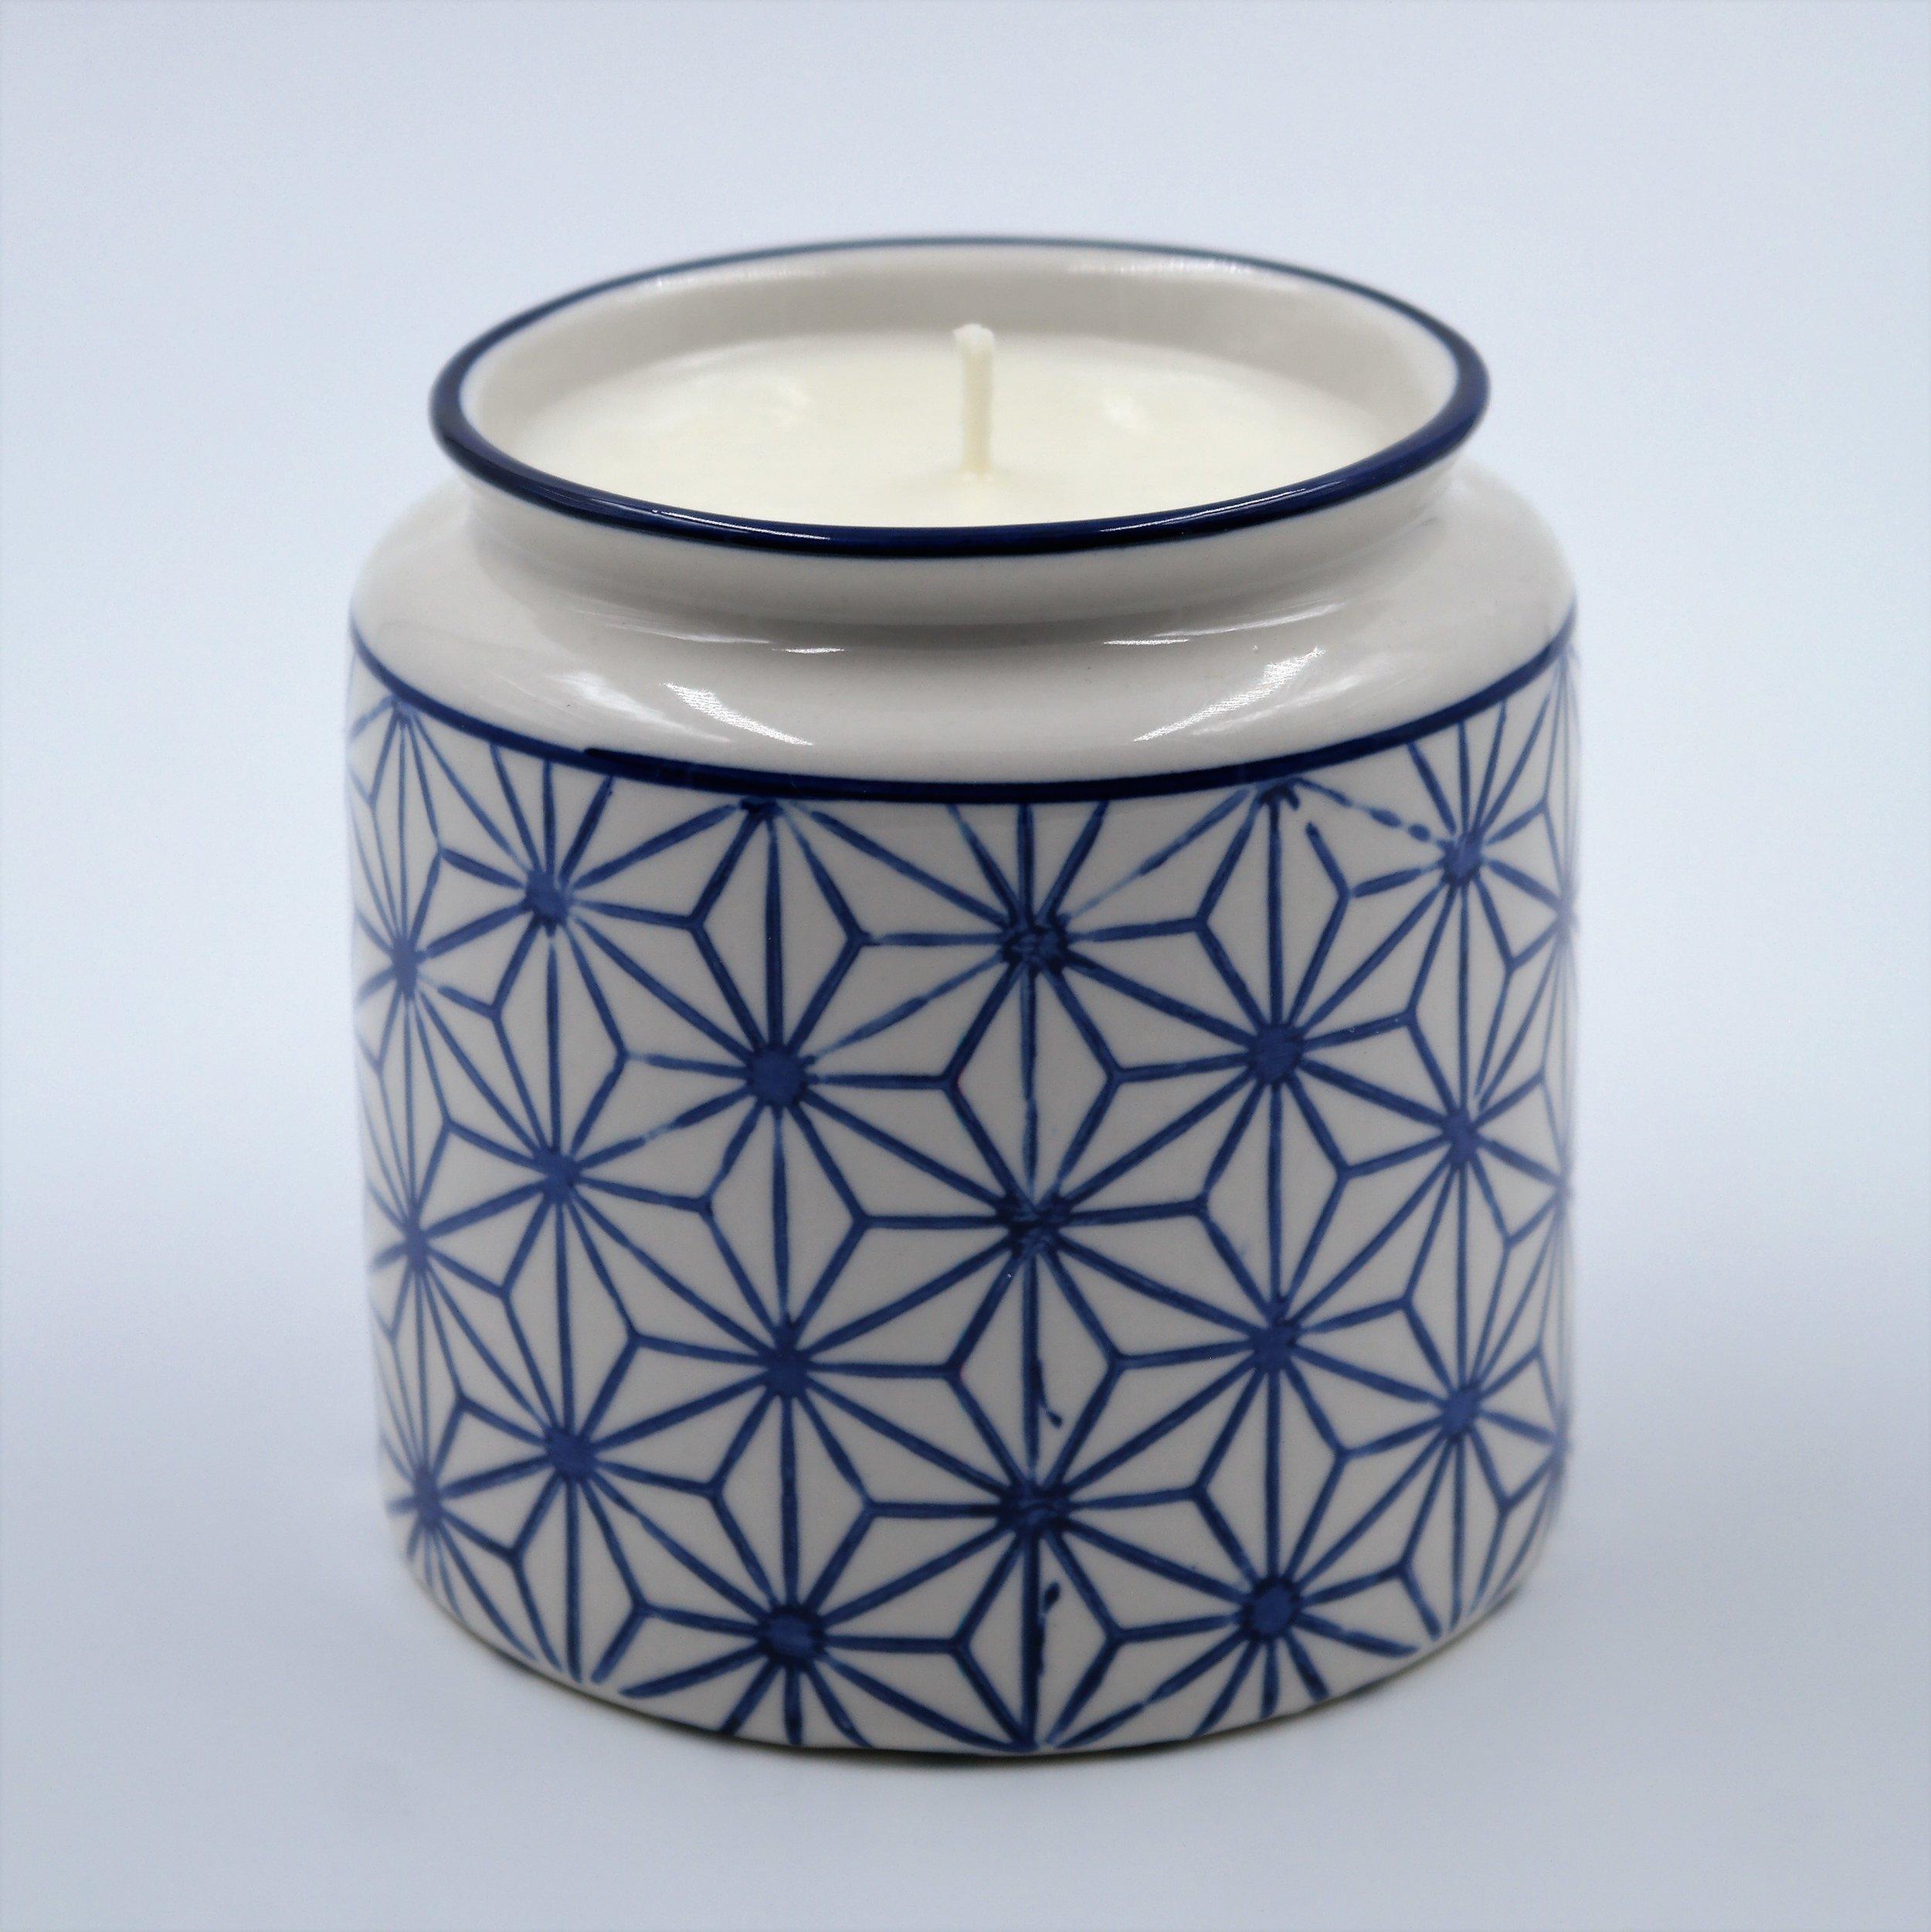 Woodland Soy Wax Candle - $40